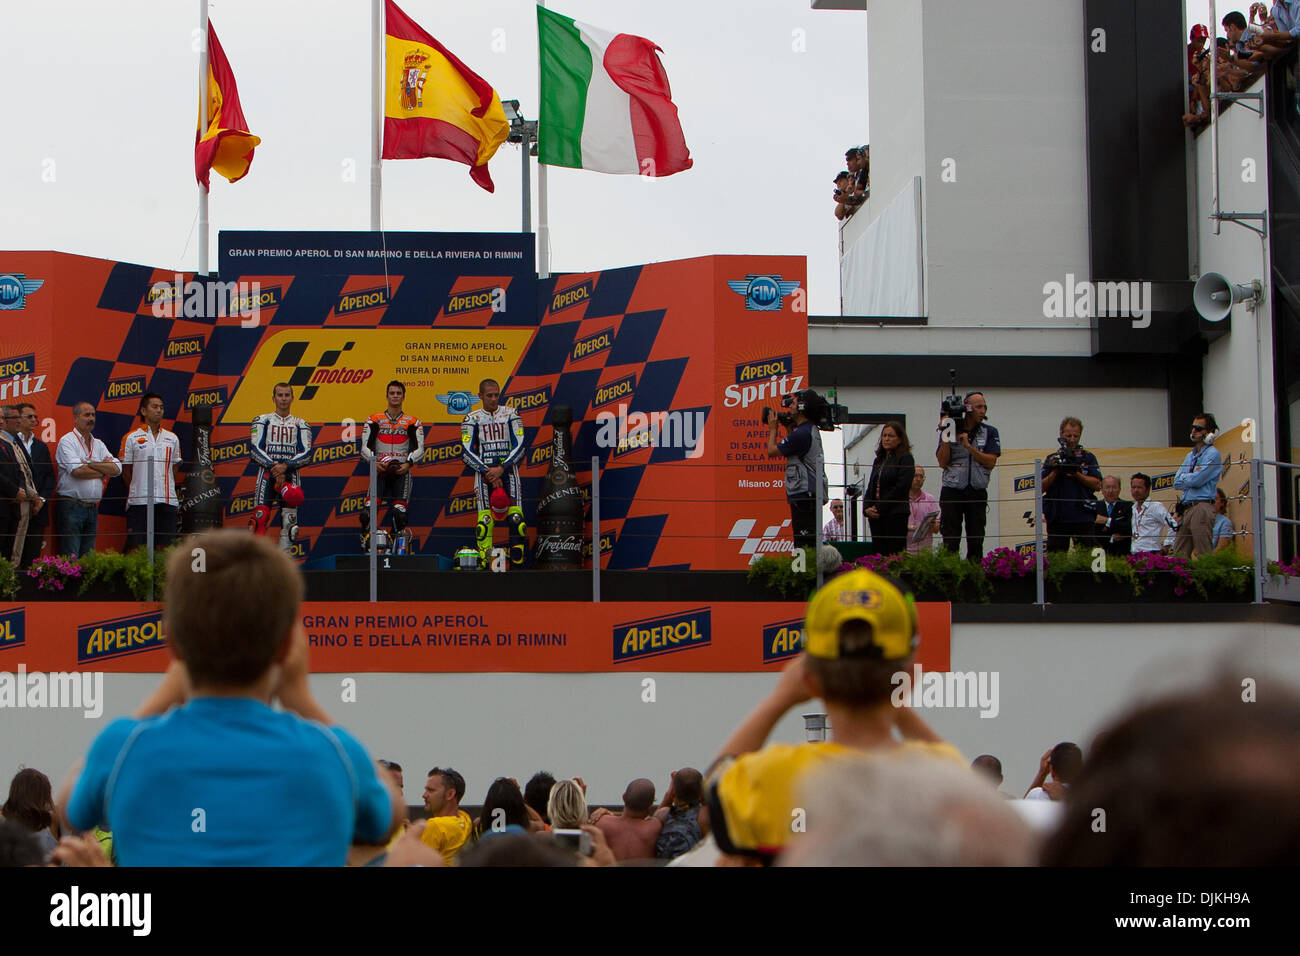 Sep. 07, 2010 - Misano Adriatico, Italy - Lorenzo (left), Pedrosa (center) and Rossi (right) on the podium of the San Marino GP in Misano Adriatico, Italy. (Credit Image: © Andrea Ranalli/Southcreek Global/ZUMApress.com) - Stock Image